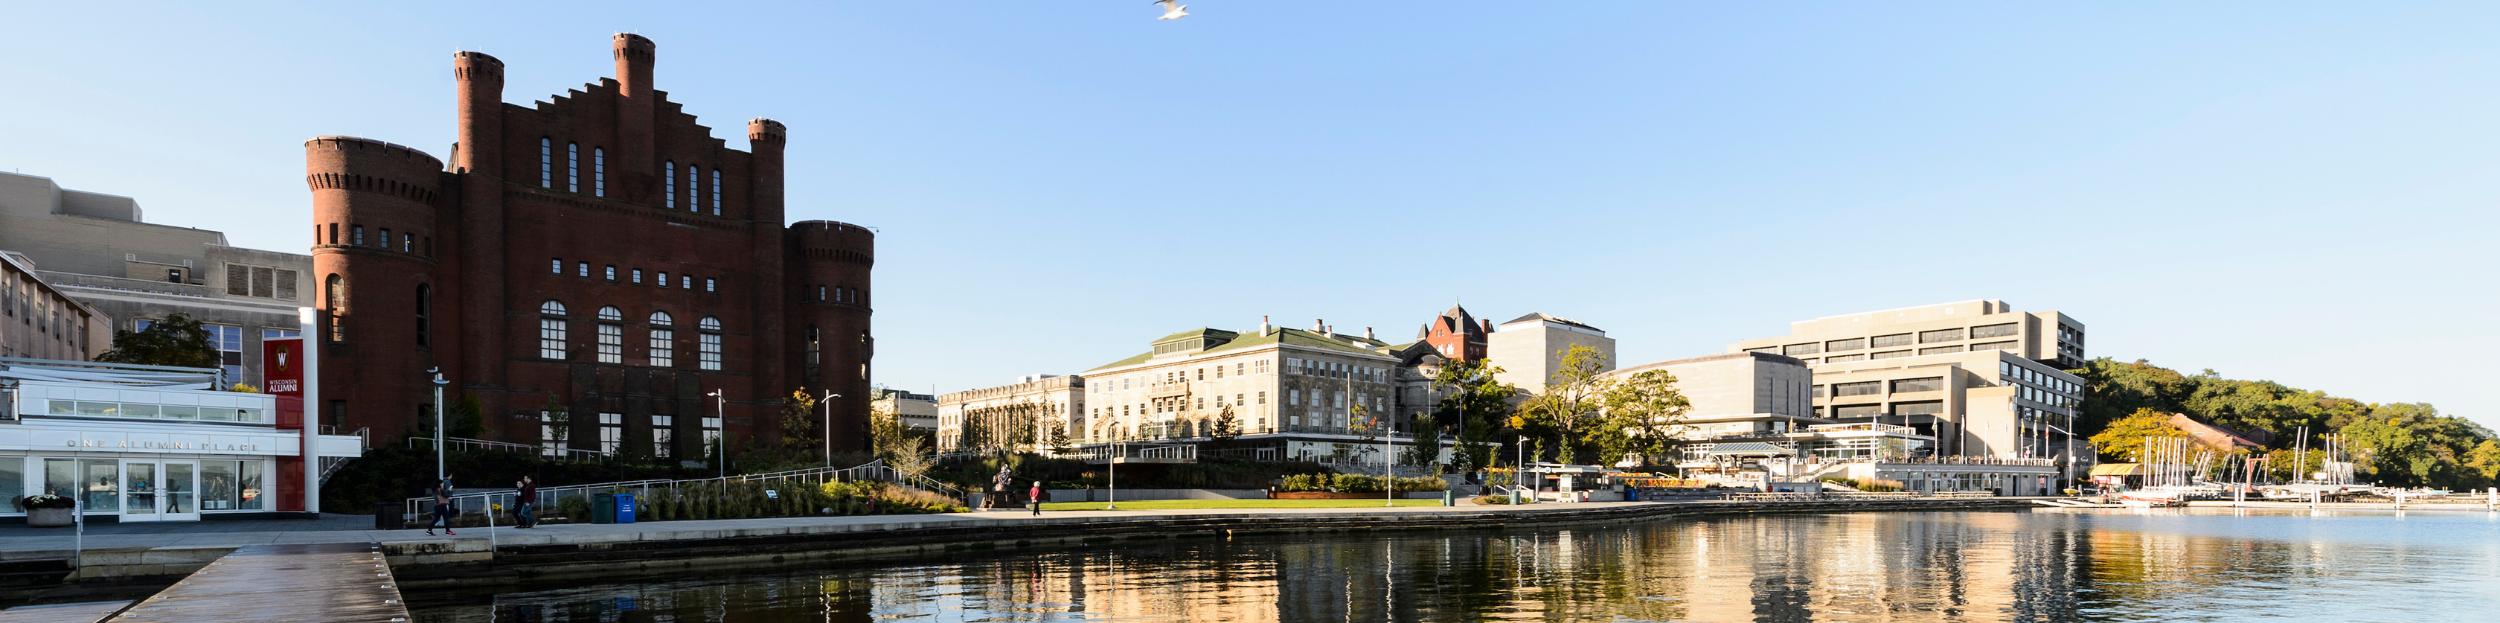 Campus and lake